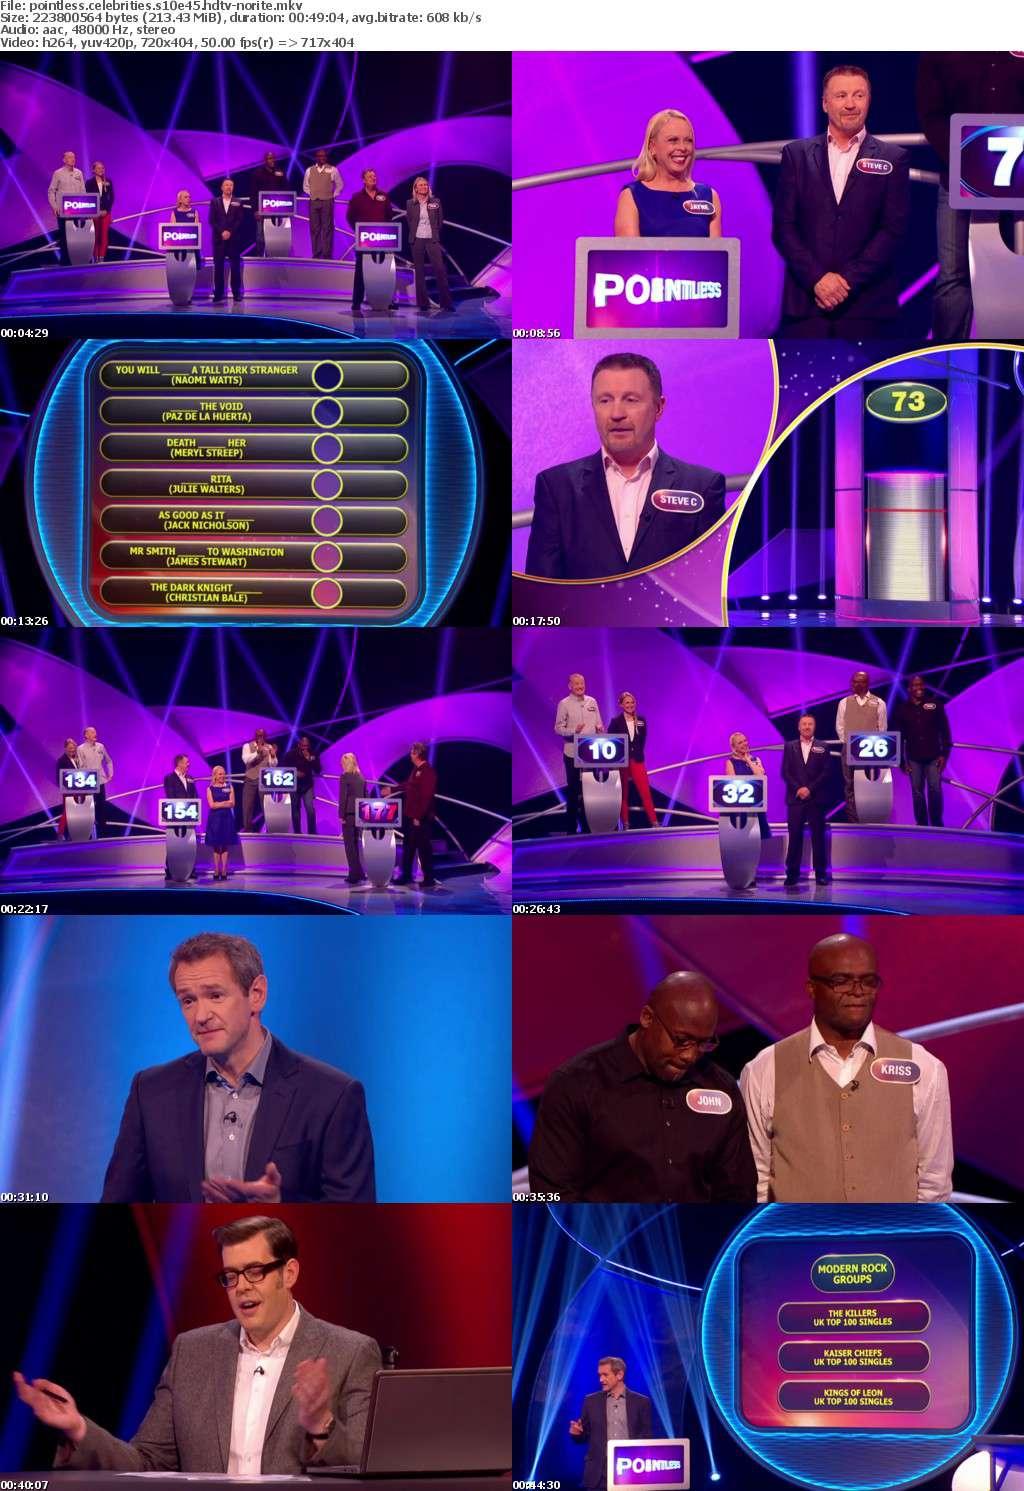 Pointless Celebrities S10E45 HDTV x264-NORiTE